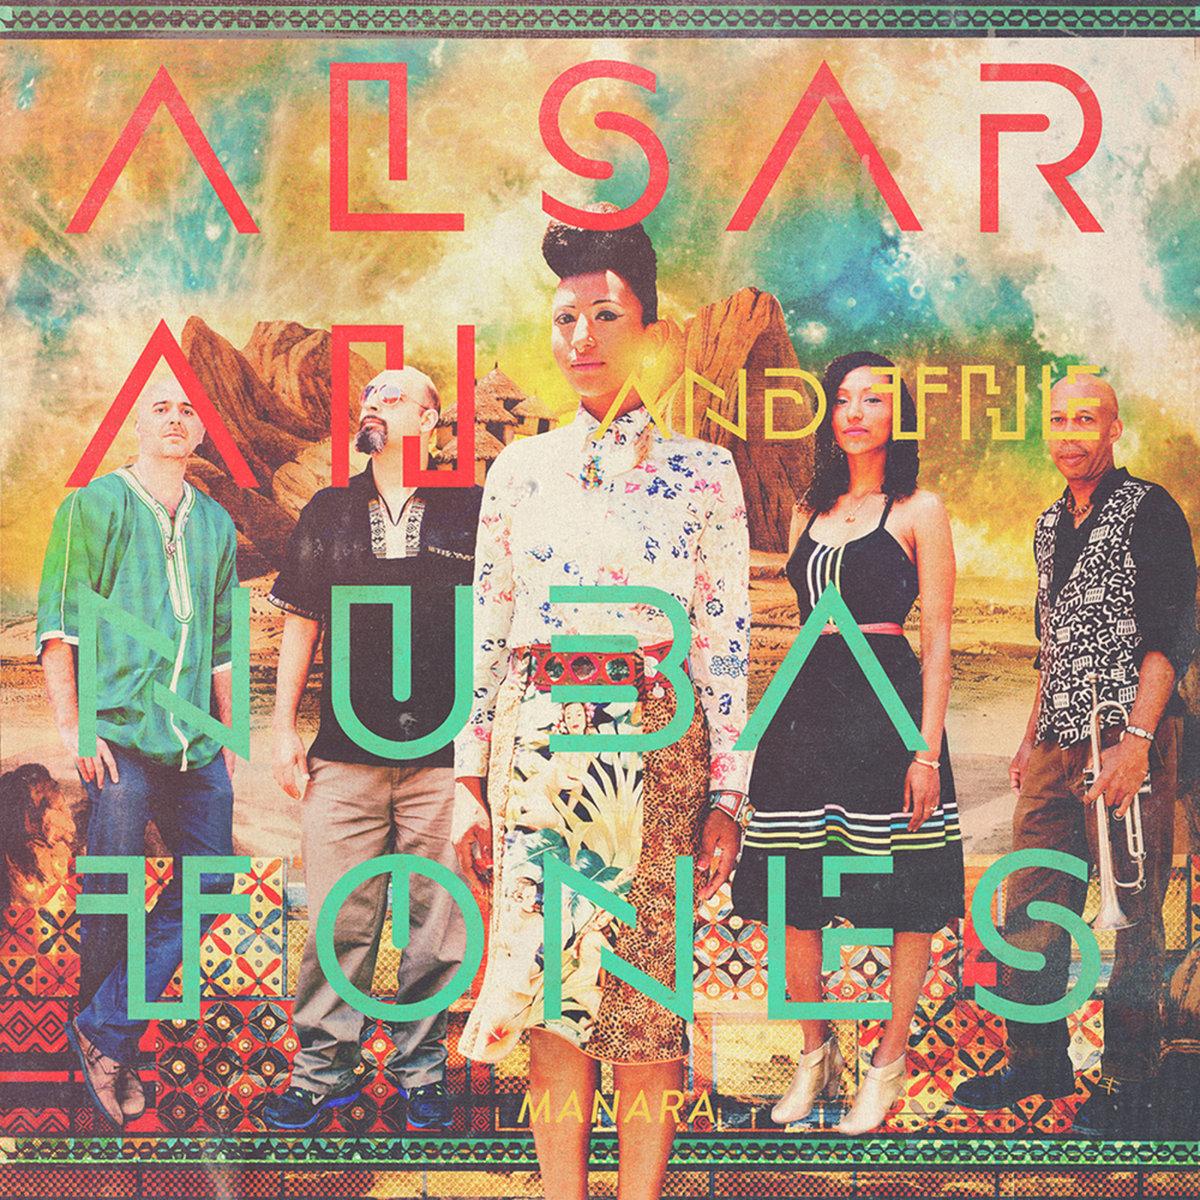 ALSARAH & THE NUBATONES - MANARA (WONDERWHEEL, 2016)